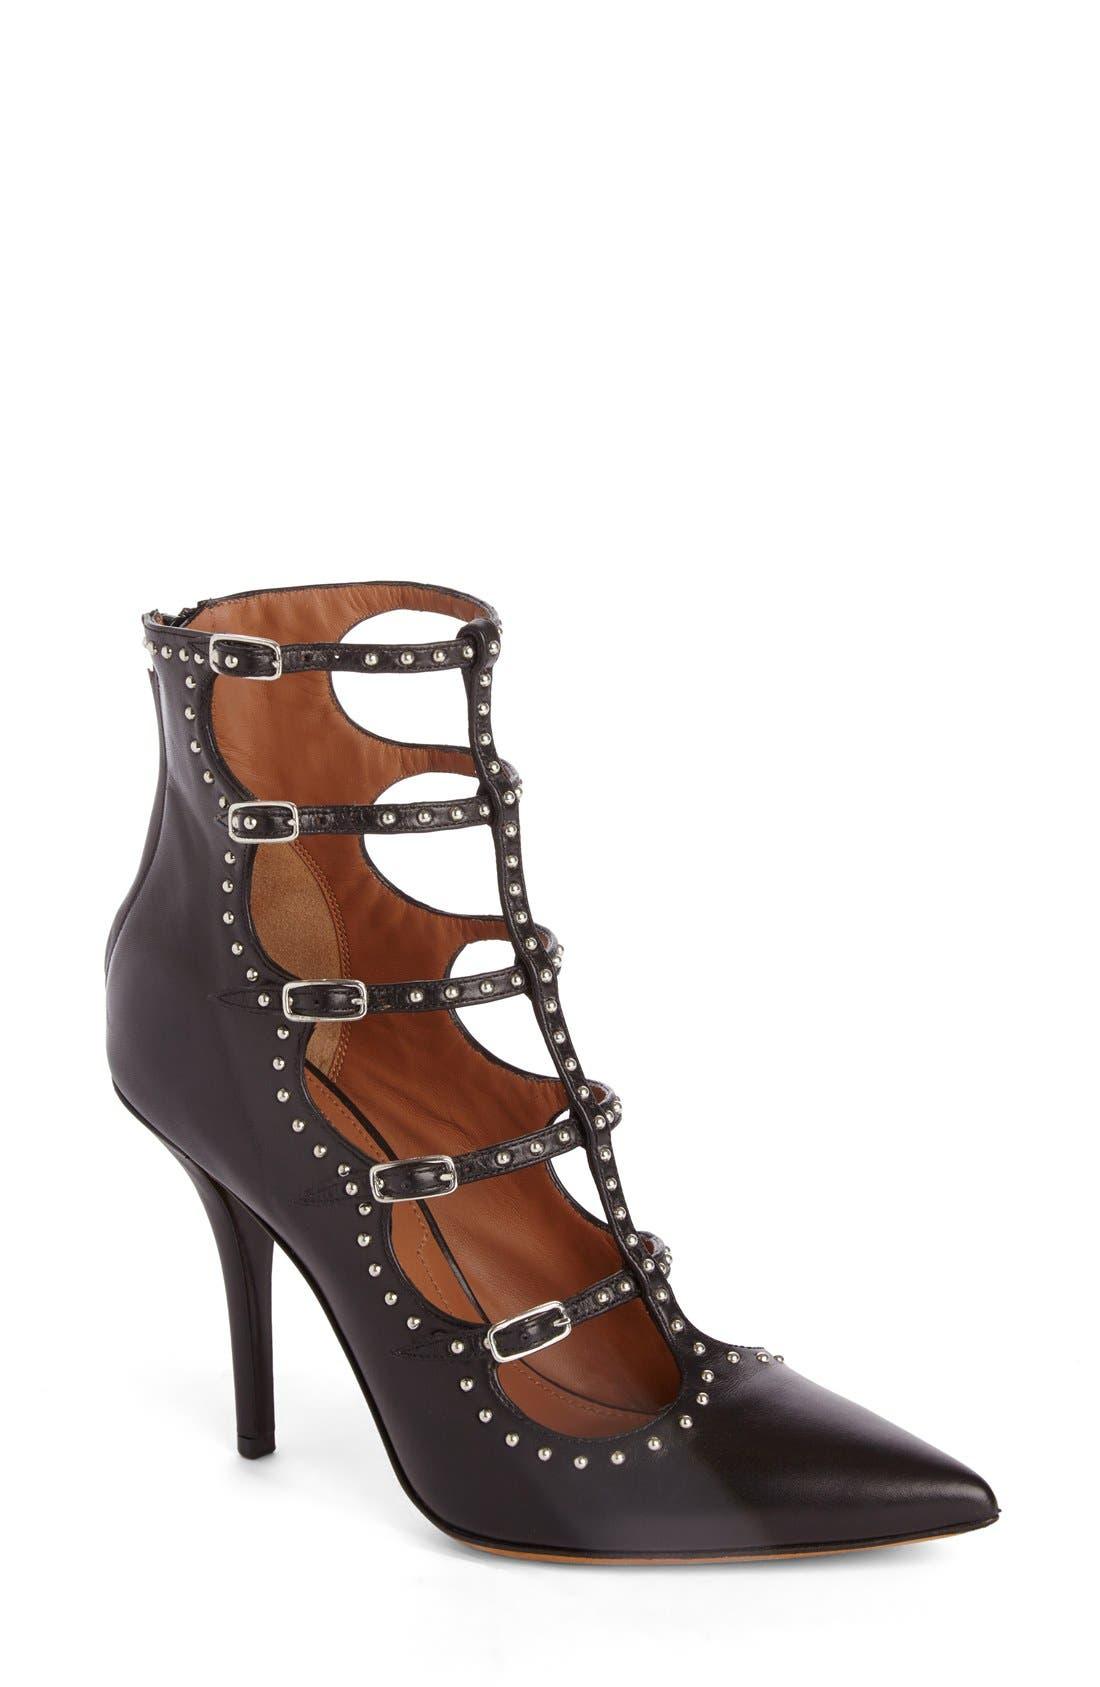 Alternate Image 1 Selected - Givenchy Elegant Cage Pump (Women)